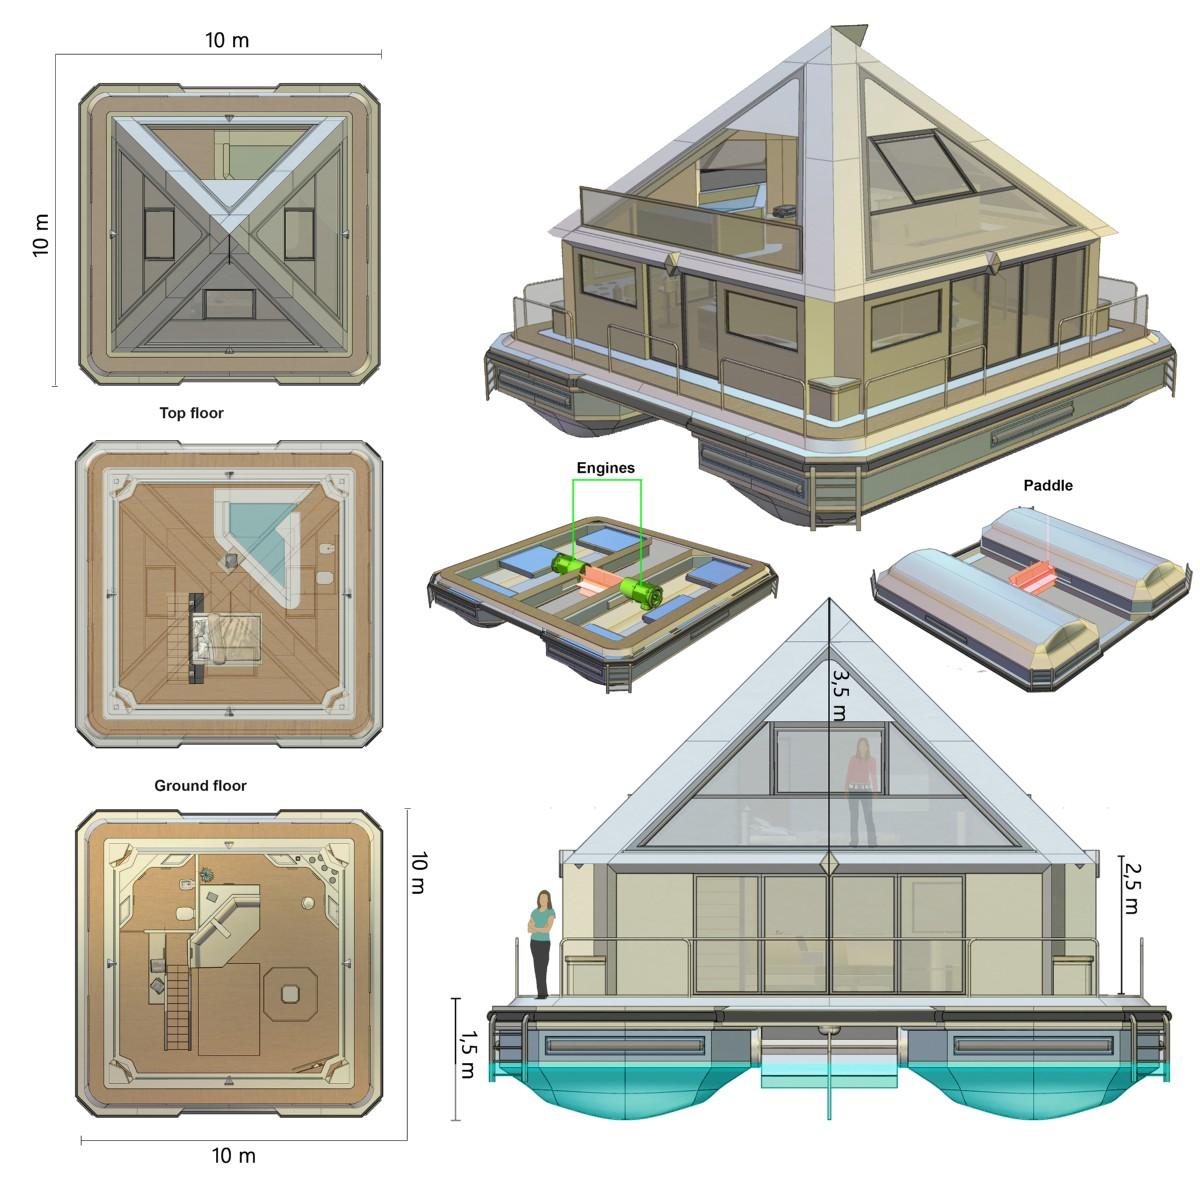 arquitectura-maya-ciudad-flotante-autosustentable-piramides-wayaland